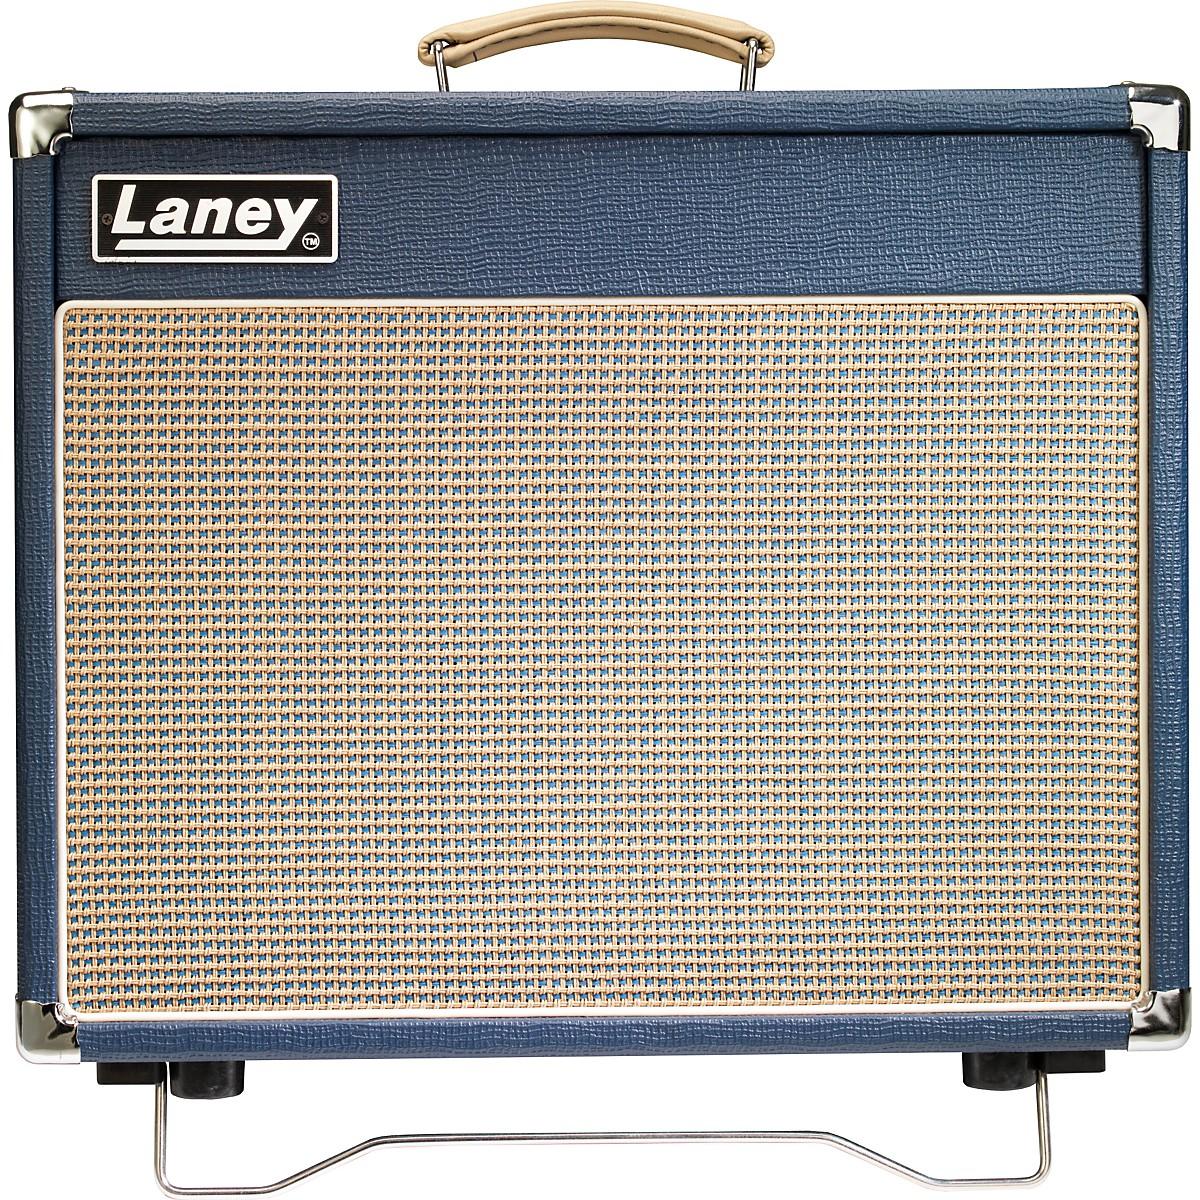 Laney L20T-112 20W 1x12 Tube Guitar Combo Amp